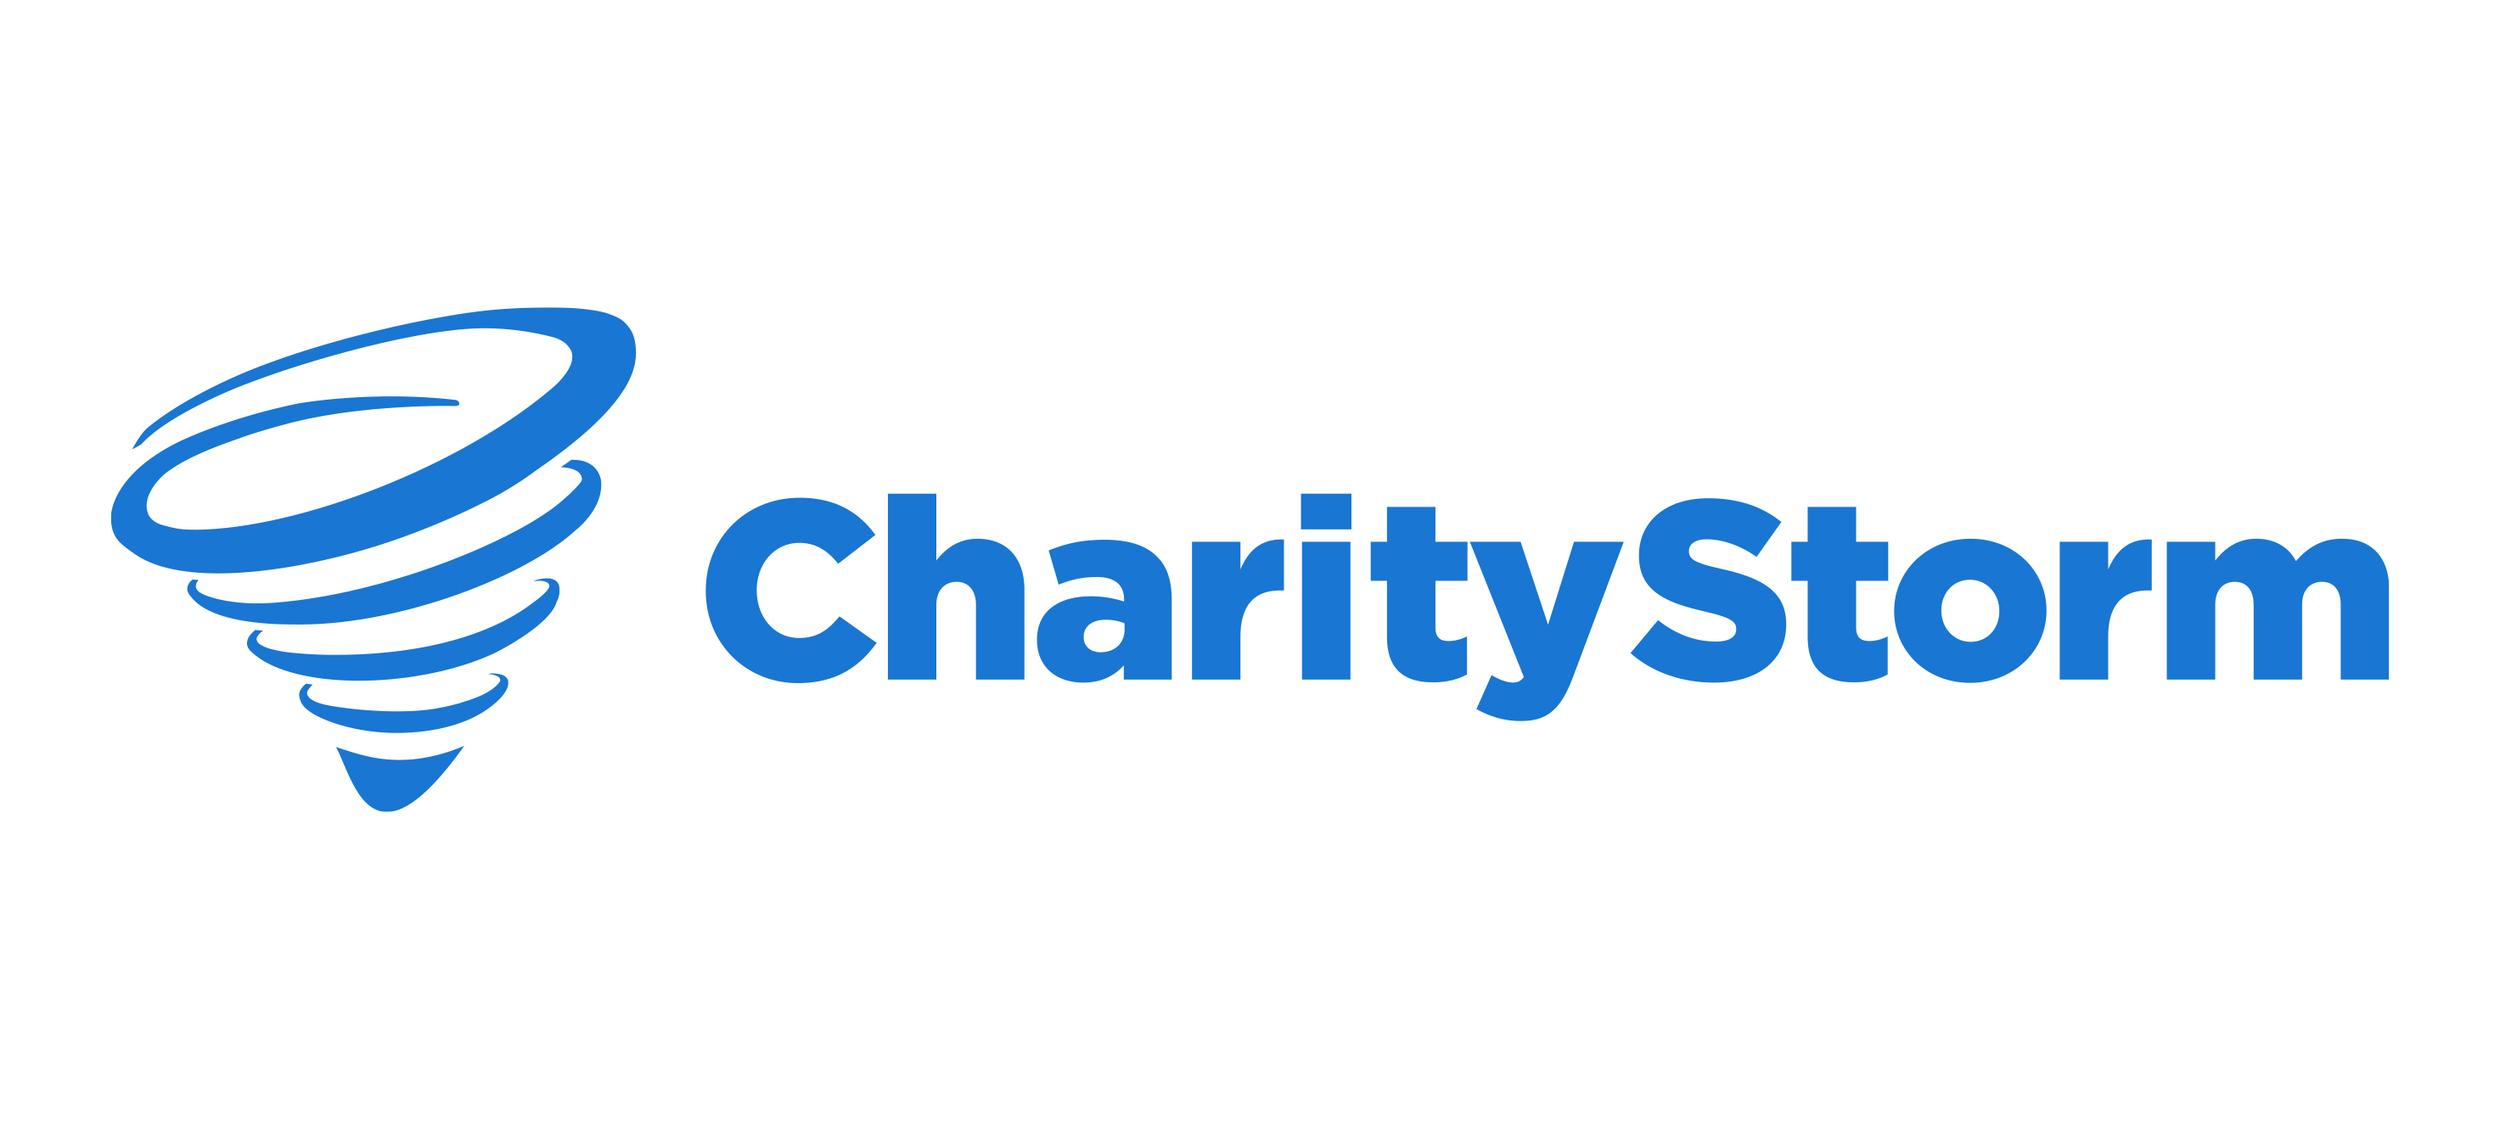 CharityStorm